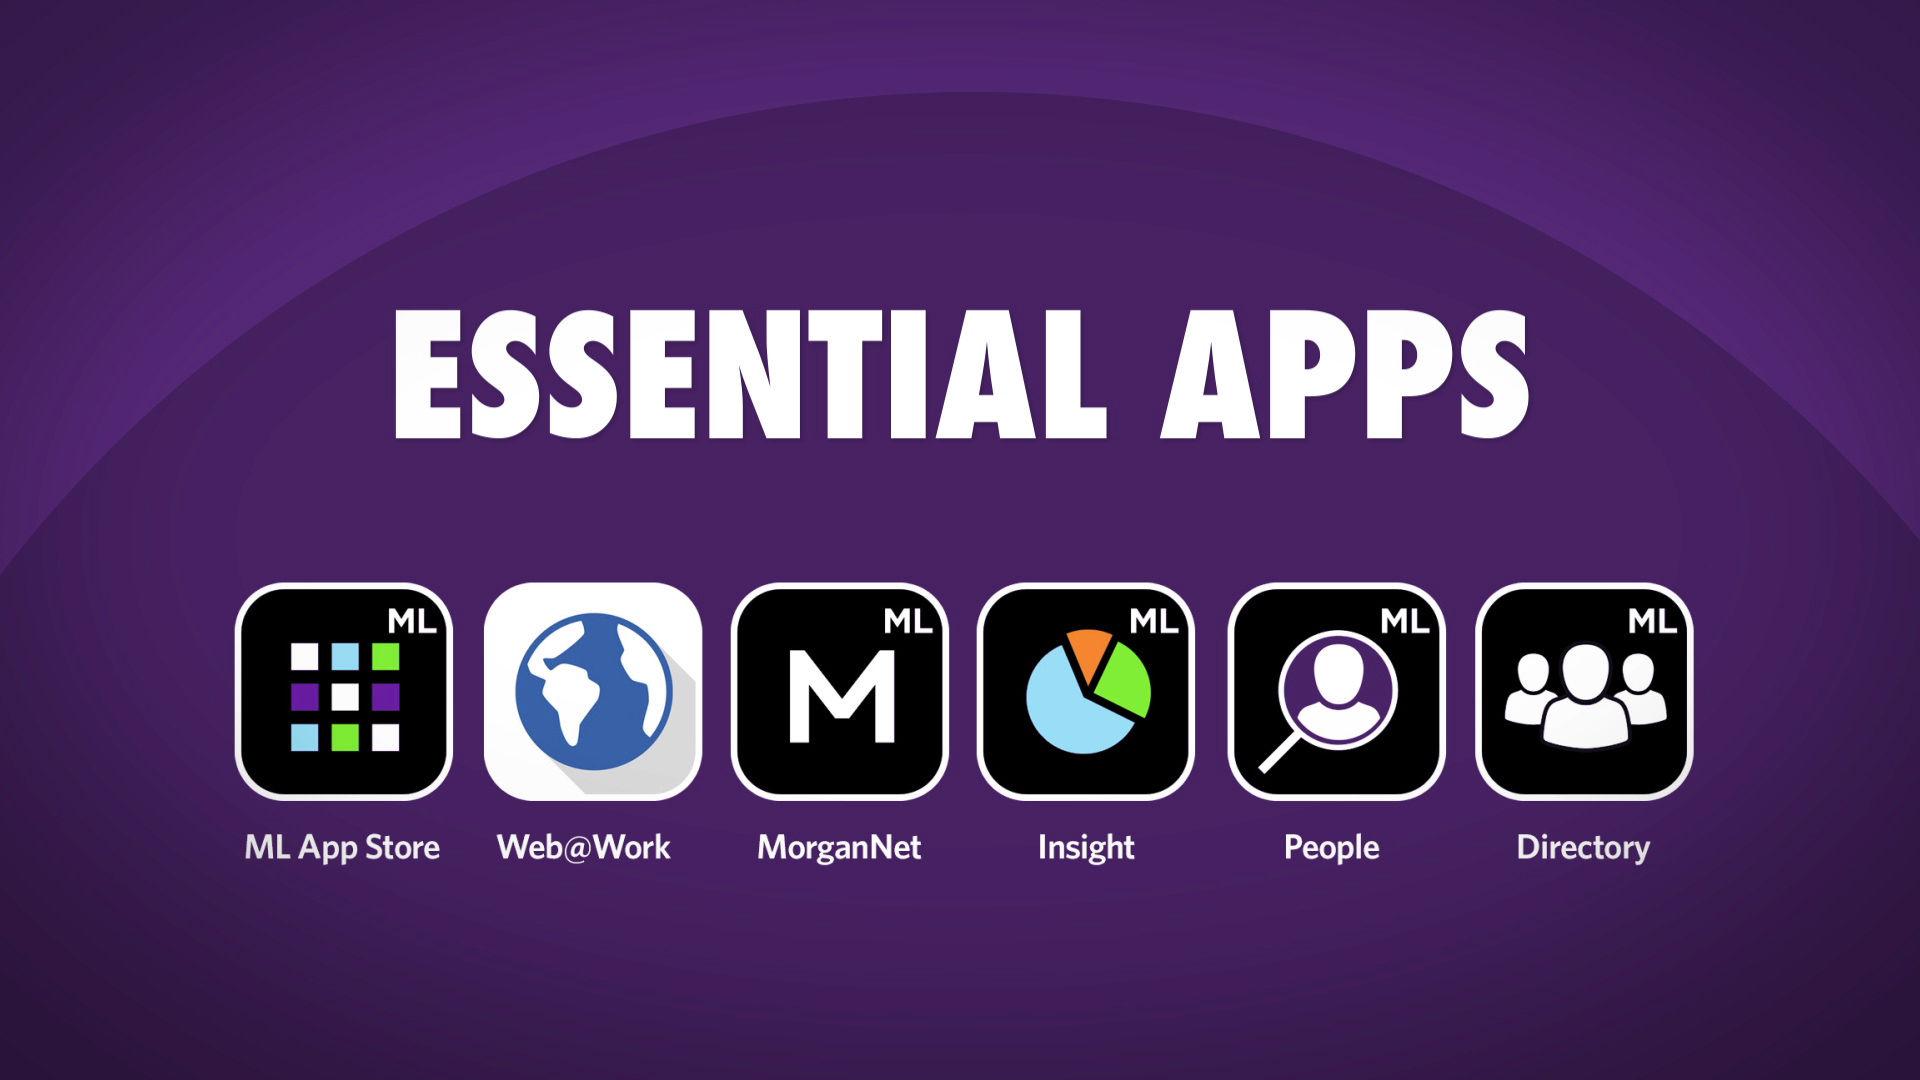 Morgan Lewis: Essential Apps